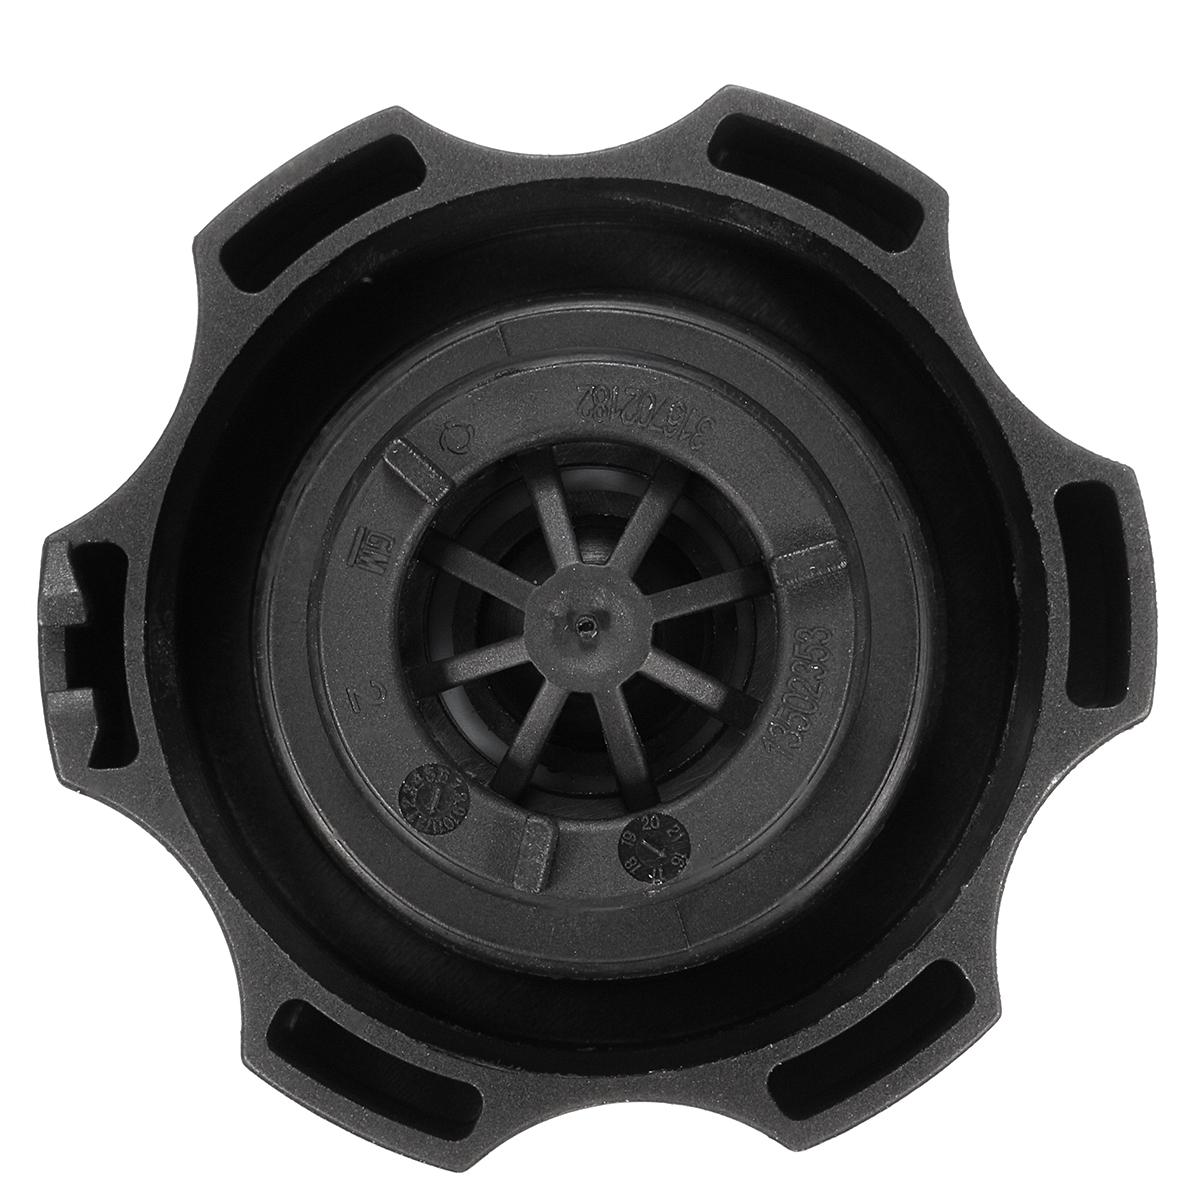 Tank Radiator Expansion Water Tank Cap For Vauxhall Astra Insignia Corsa Zafira